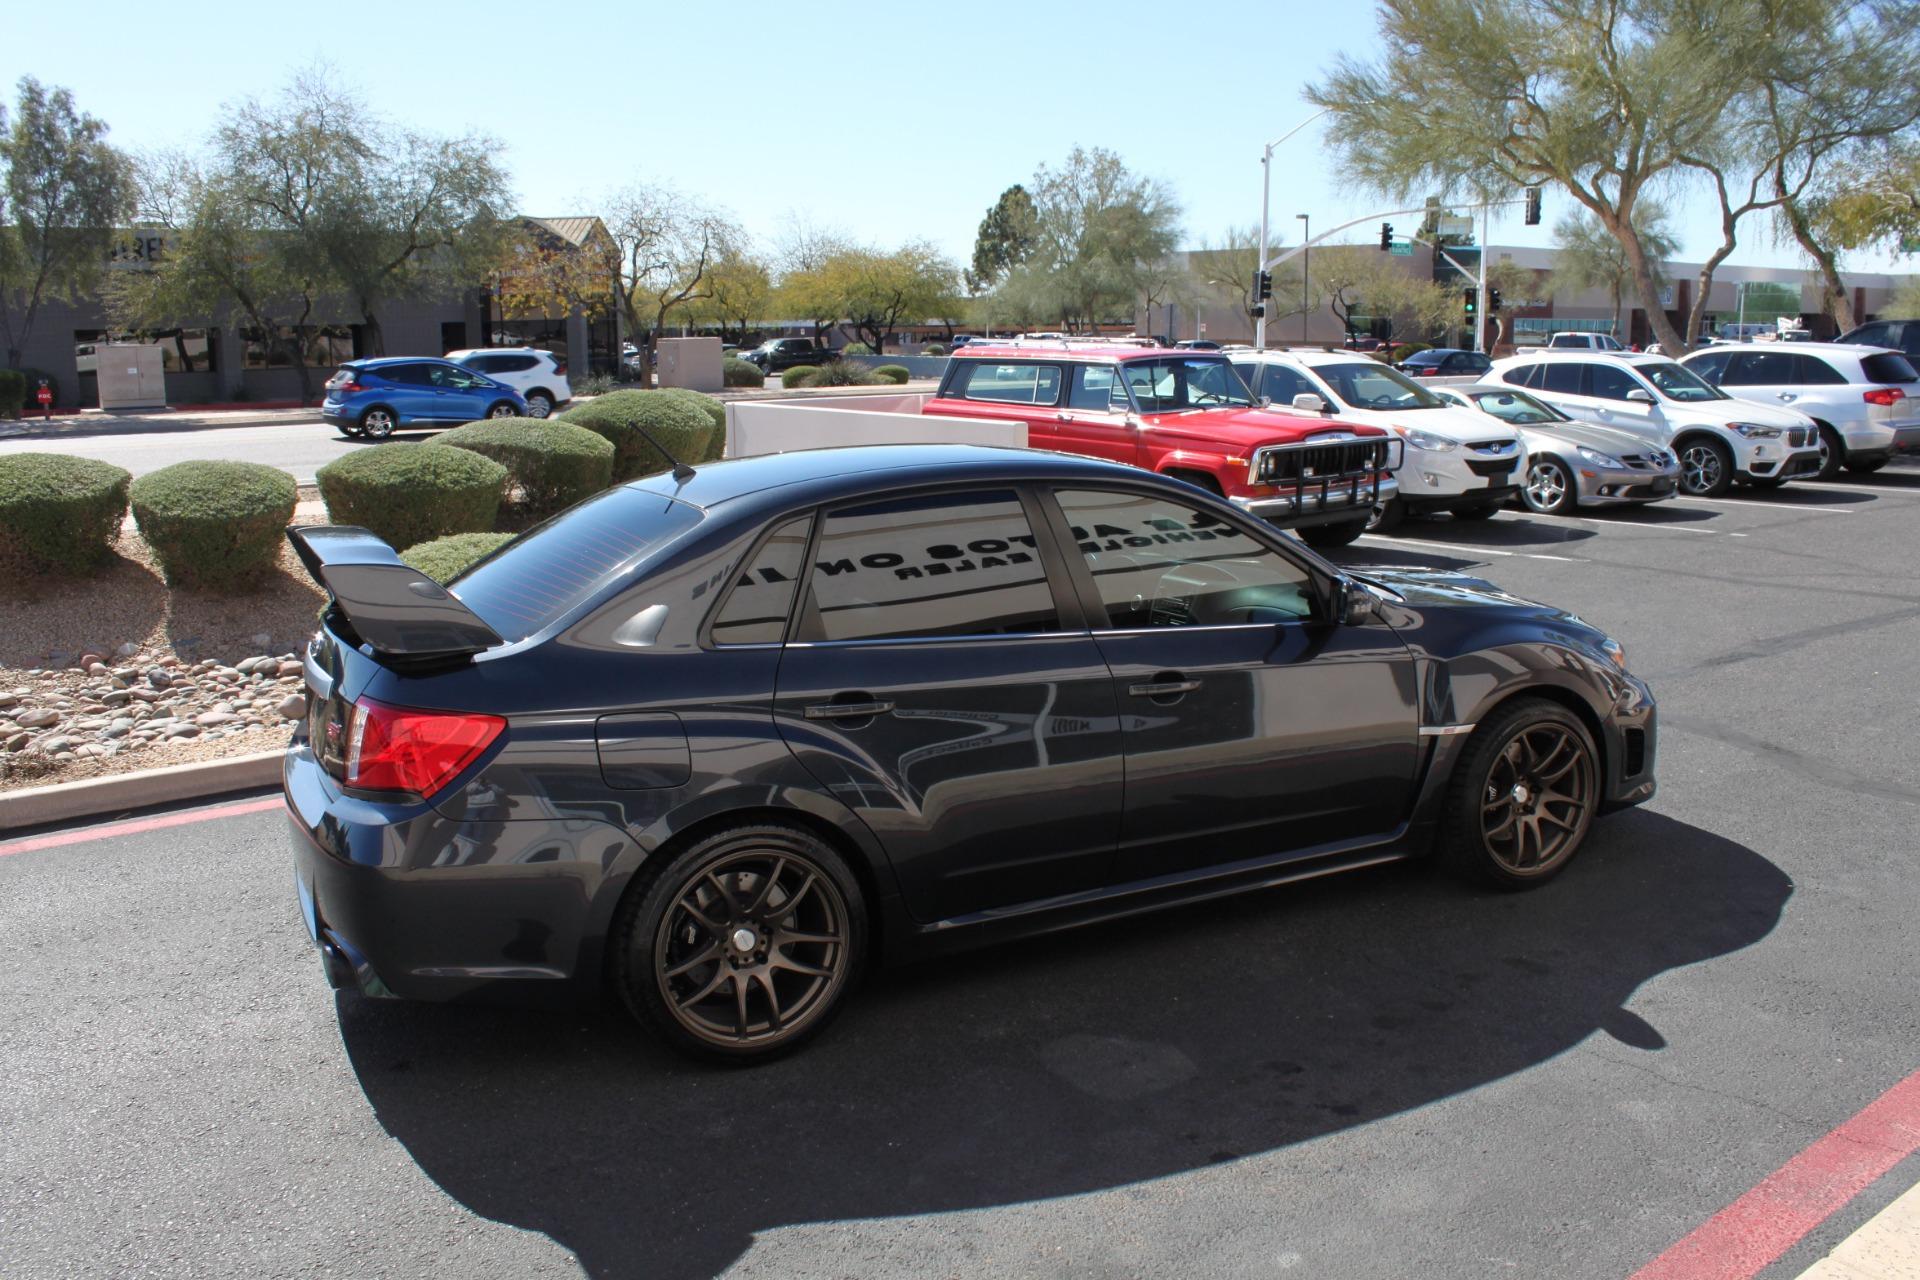 Used-2011-Subaru-Impreza-Sedan-WRX-STI-Toyota